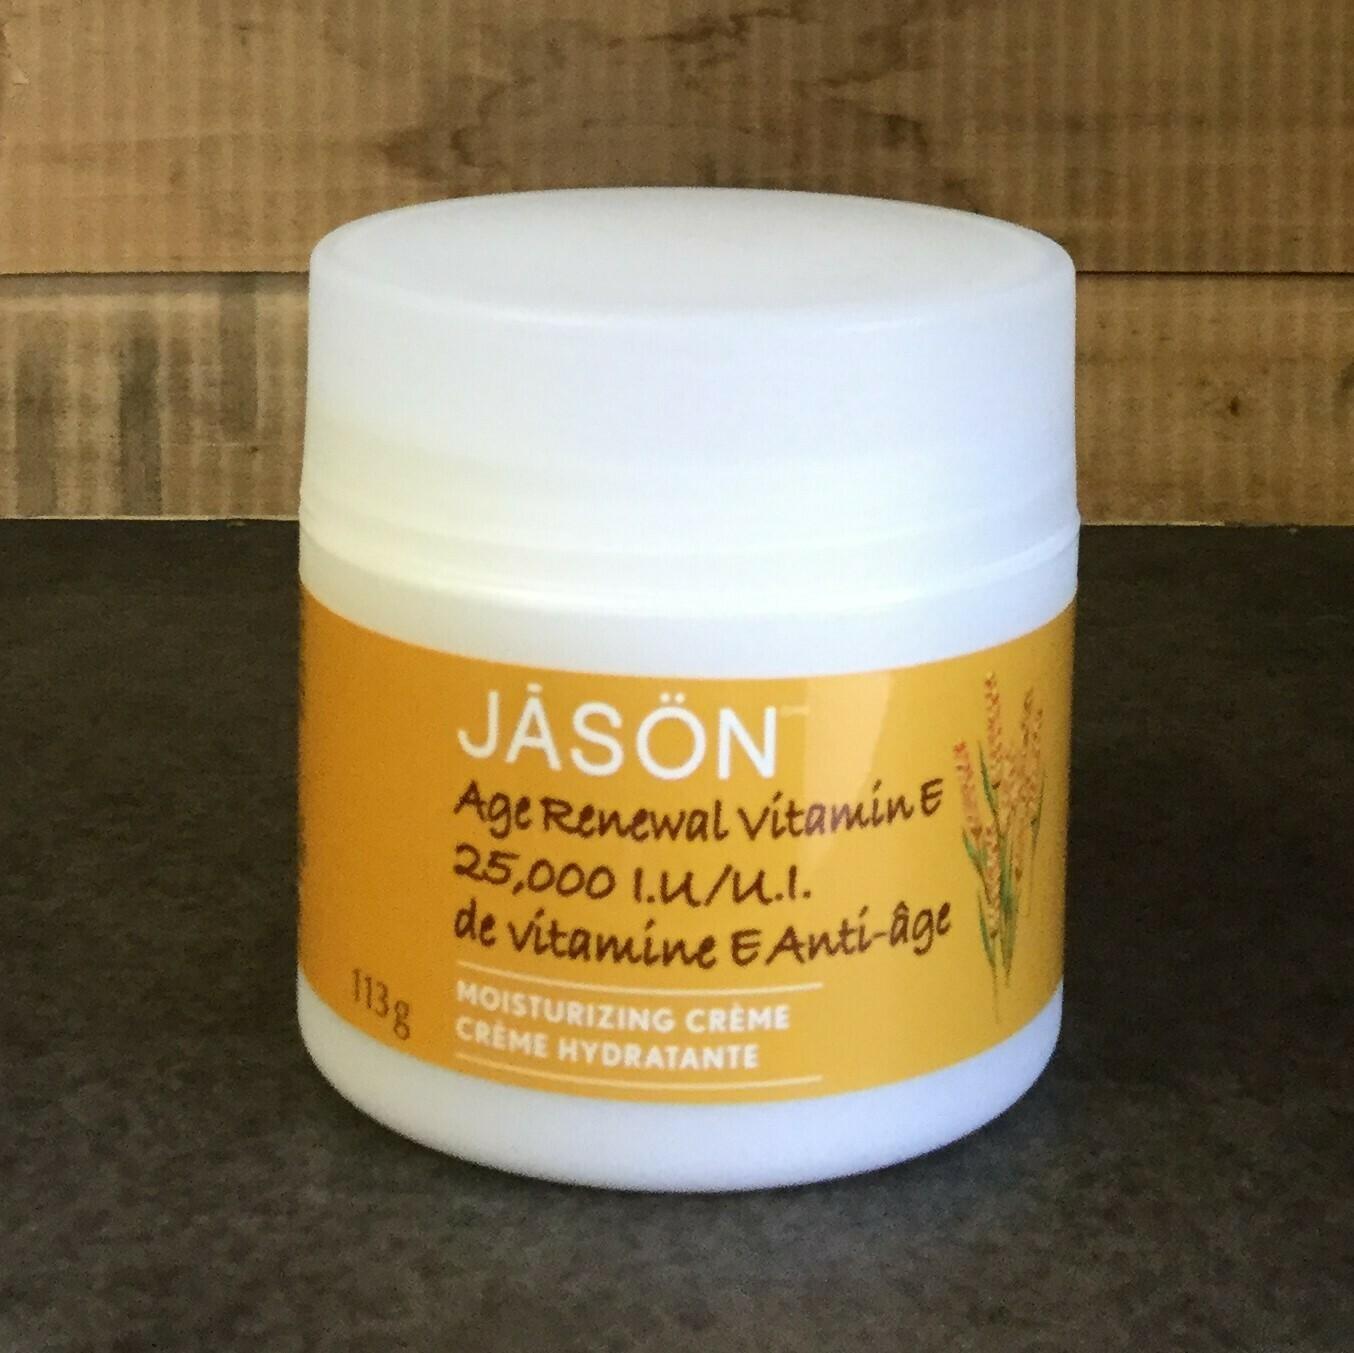 JASON Age Renewal Vitamin E